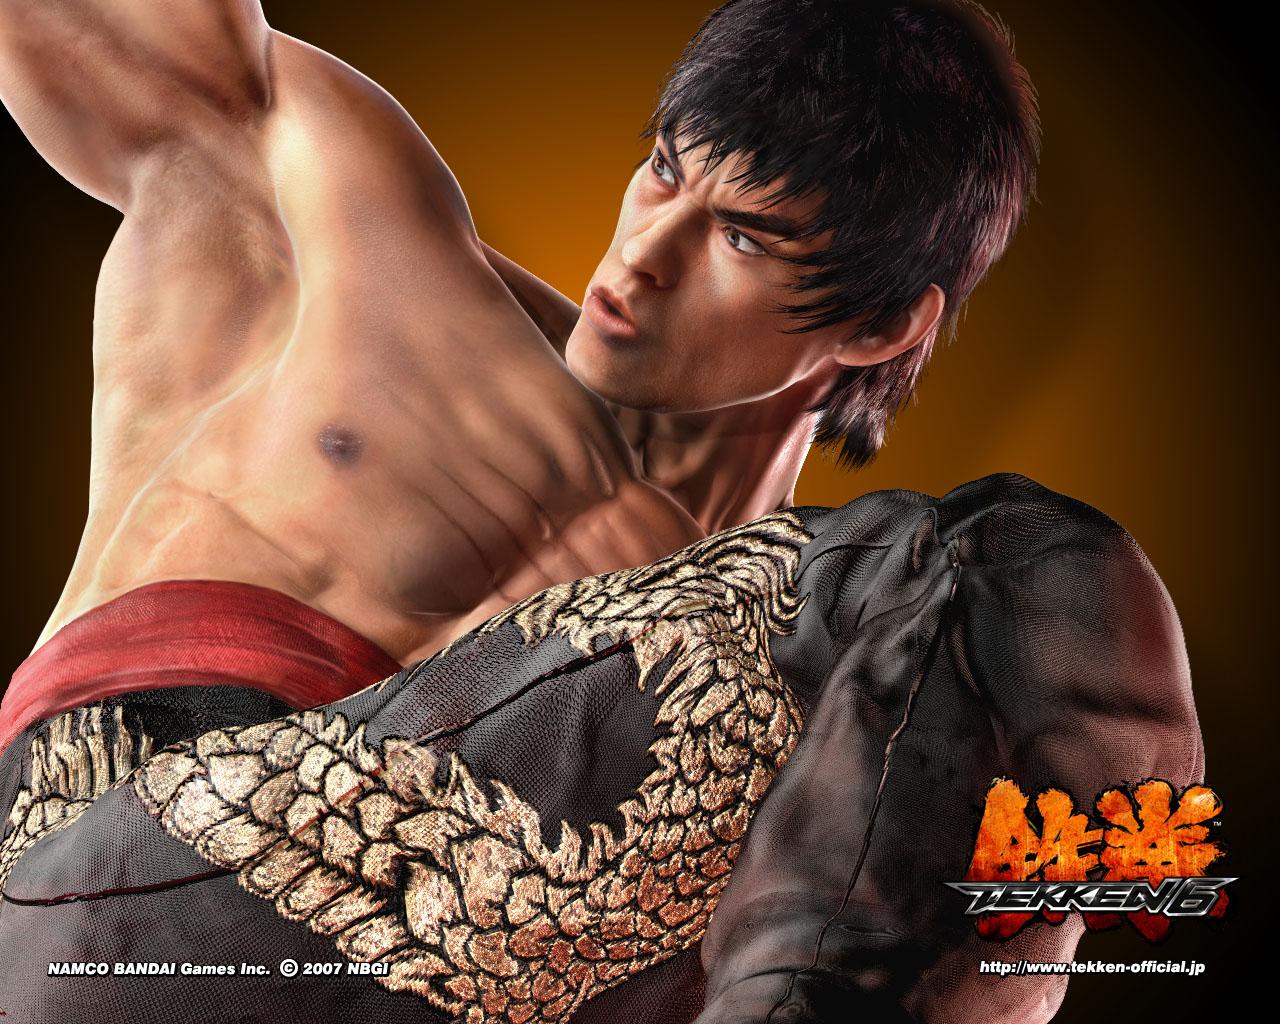 Armor King Tekken HD Wallpapers Images FemaleCelebrity 1280x1024